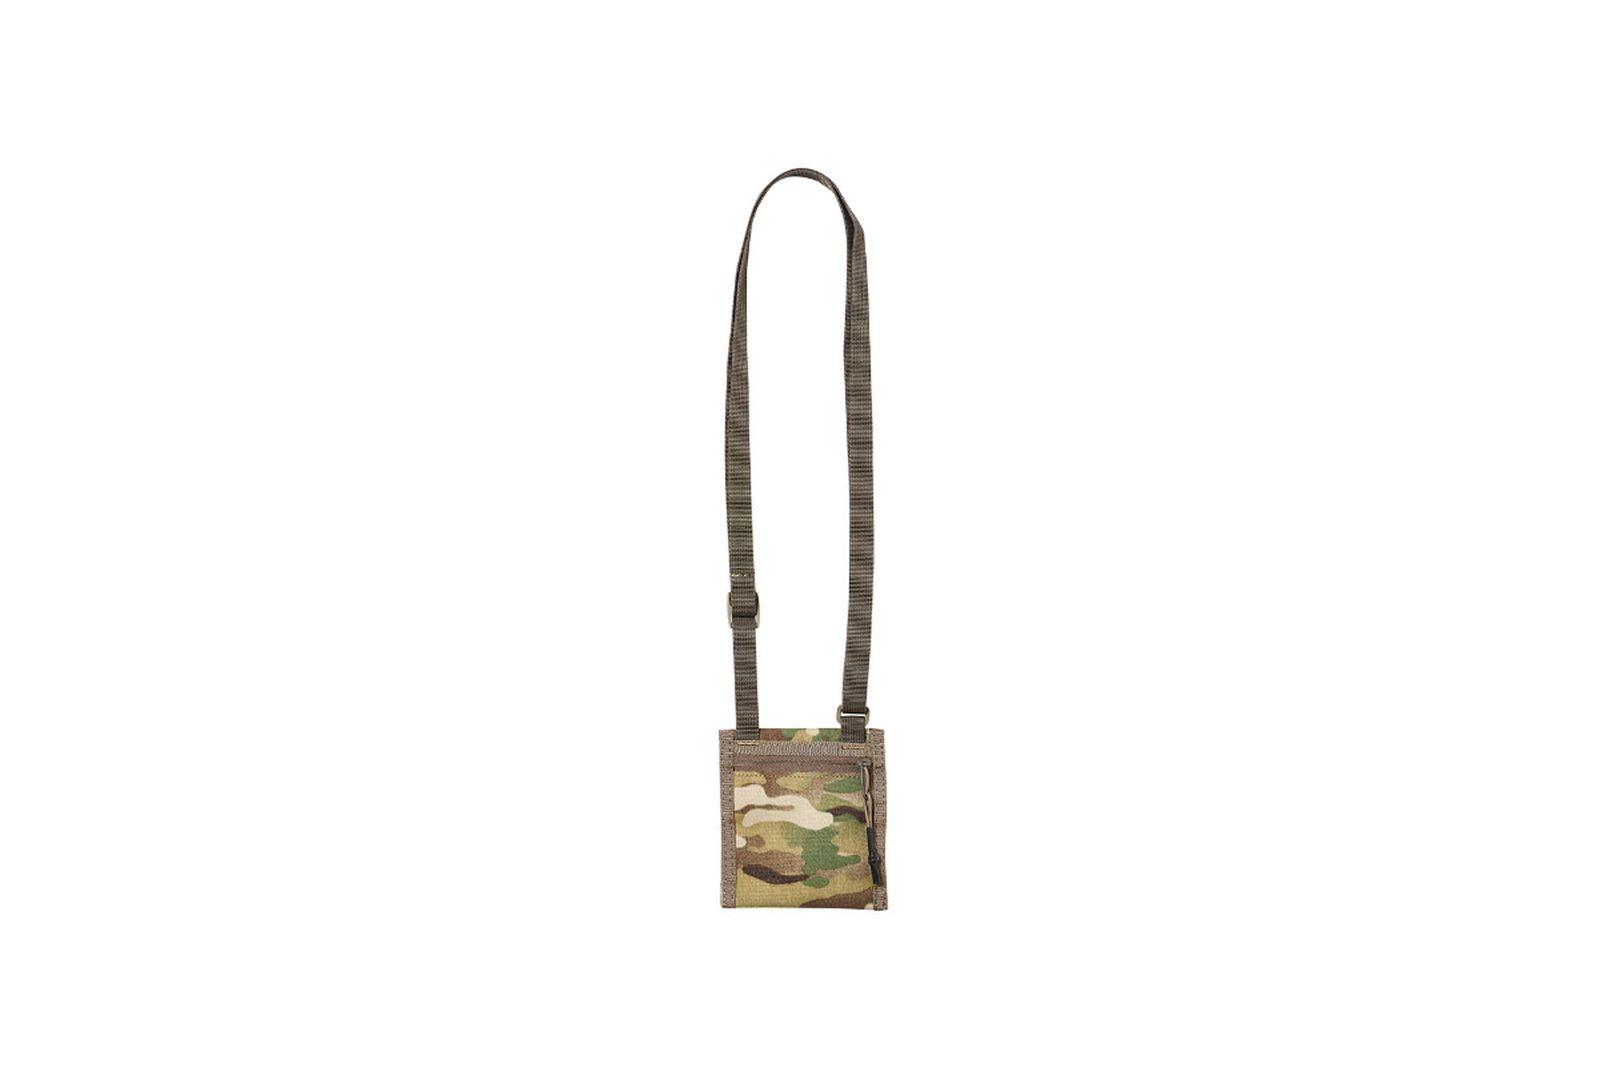 Palace 2019 Autumn Bag Stash Sack camo green 2024 TWEAKED